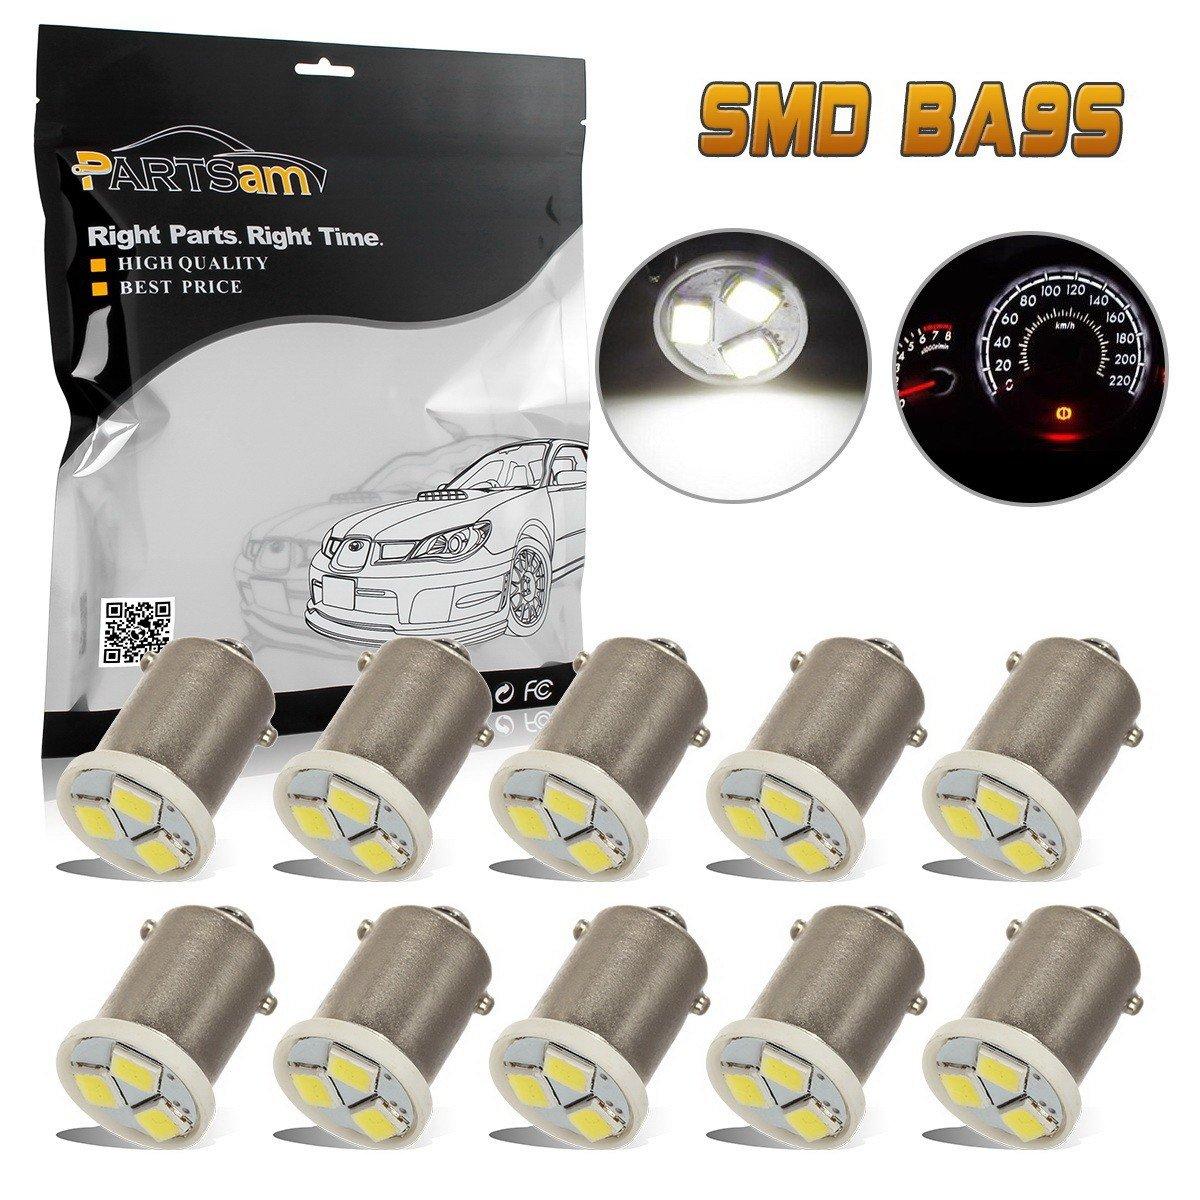 Partsam 10pcs Ba9s 6000K White LED Bulb Instrument Panel Gauge Cluster Replacement Lamp Kit 1815 1895 Bulbs 12V